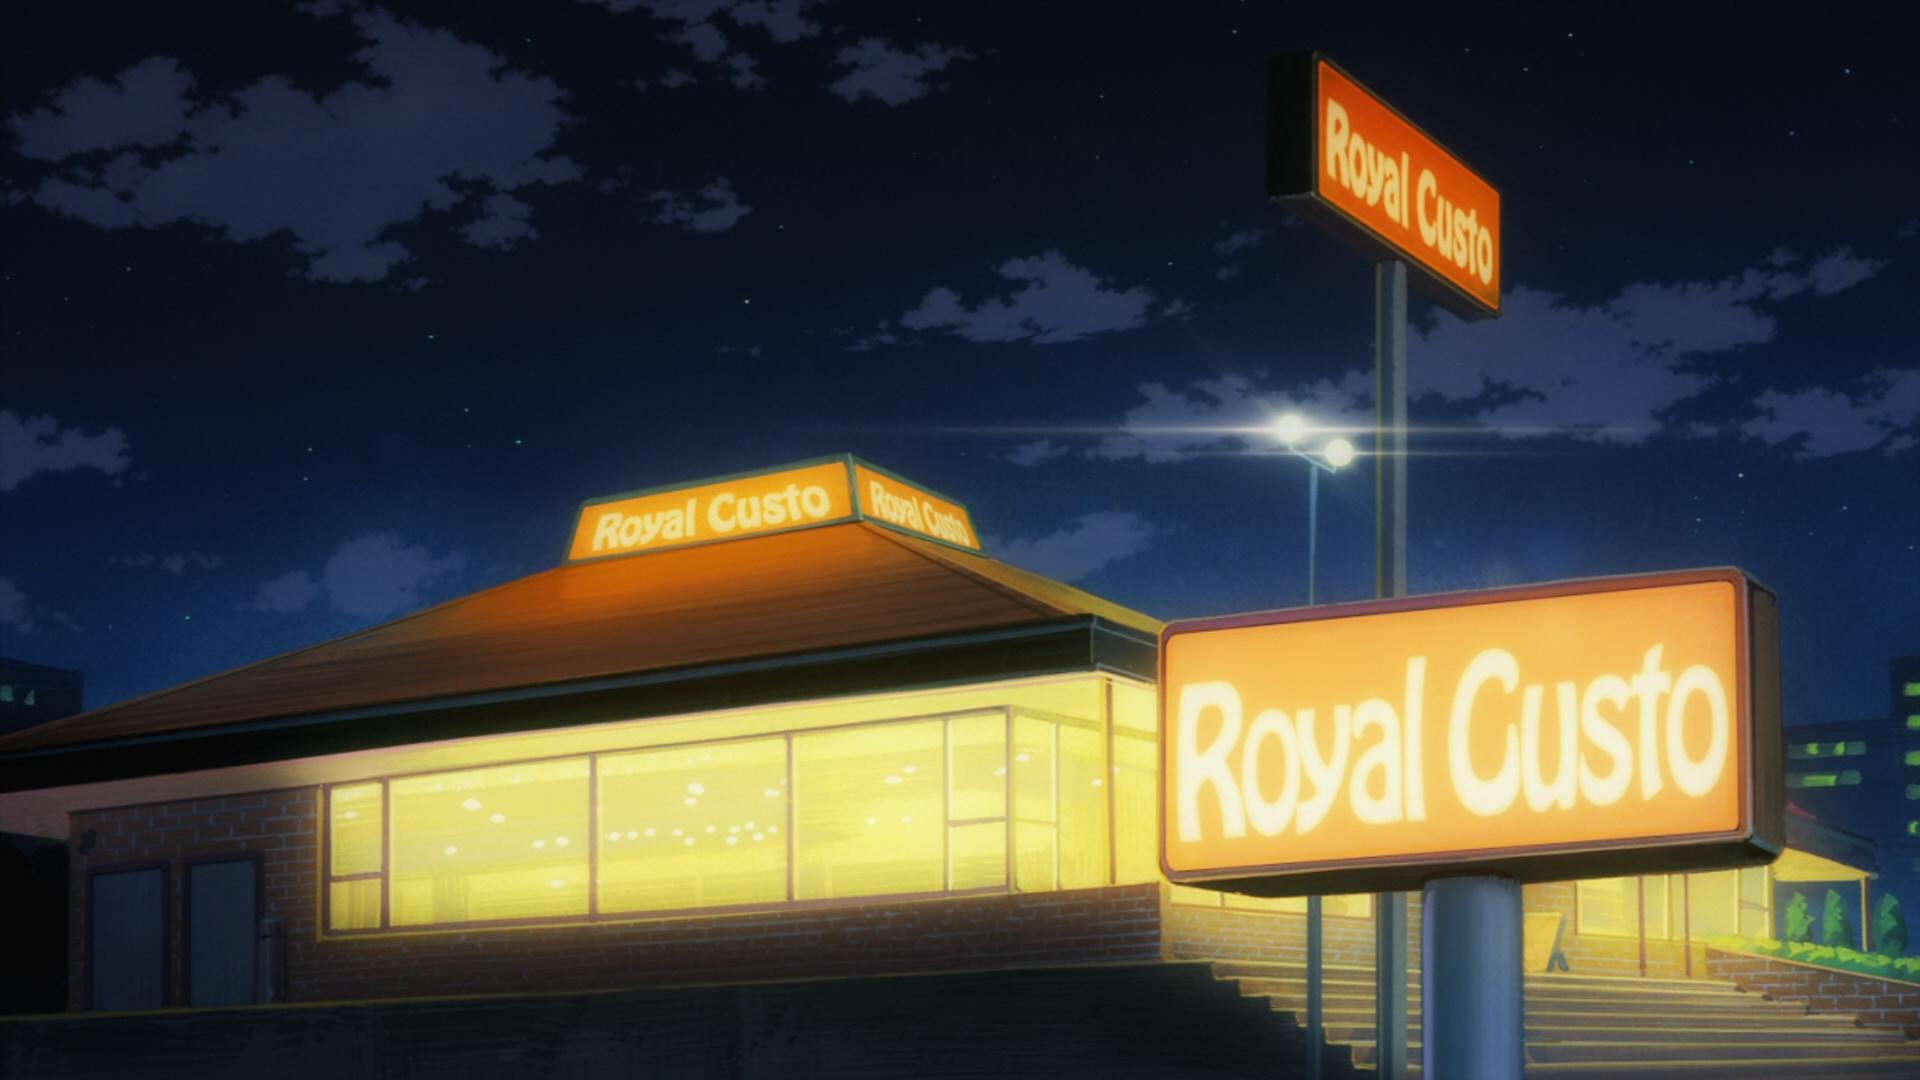 Royal Custo